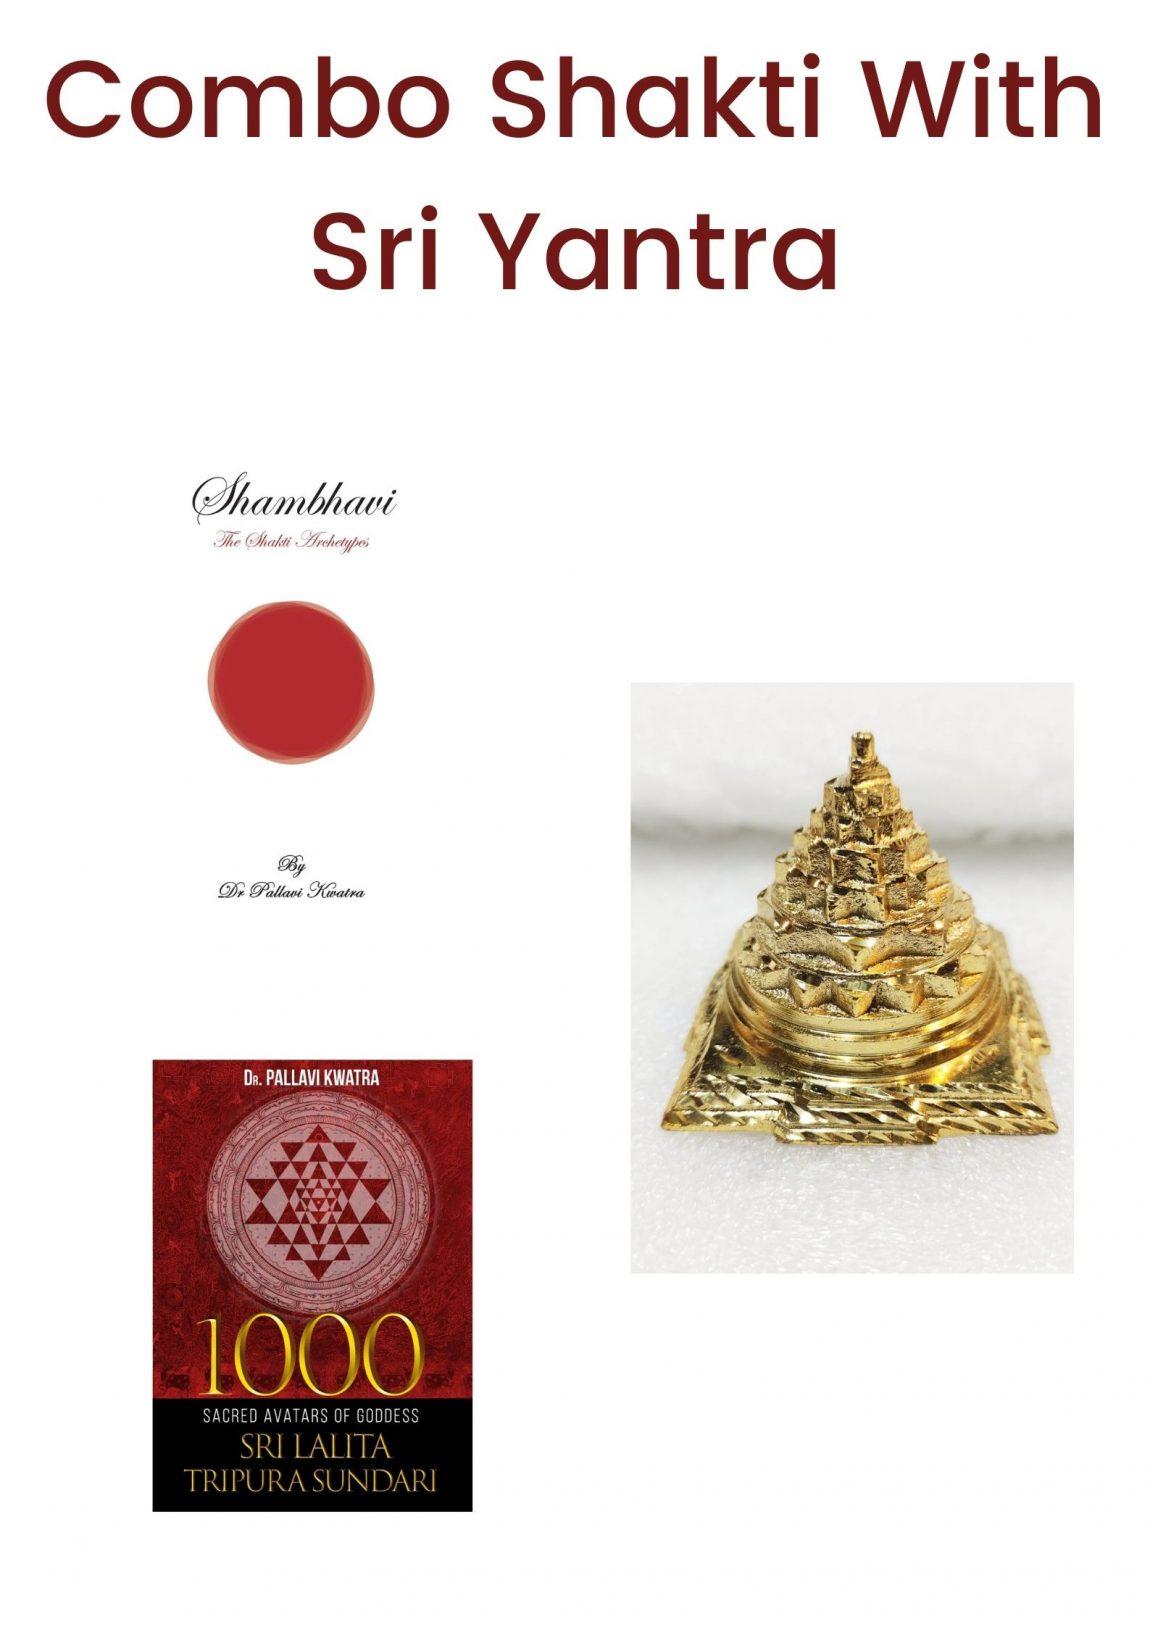 Combo-Shakti-With-Sri-Yantra-website.jpg